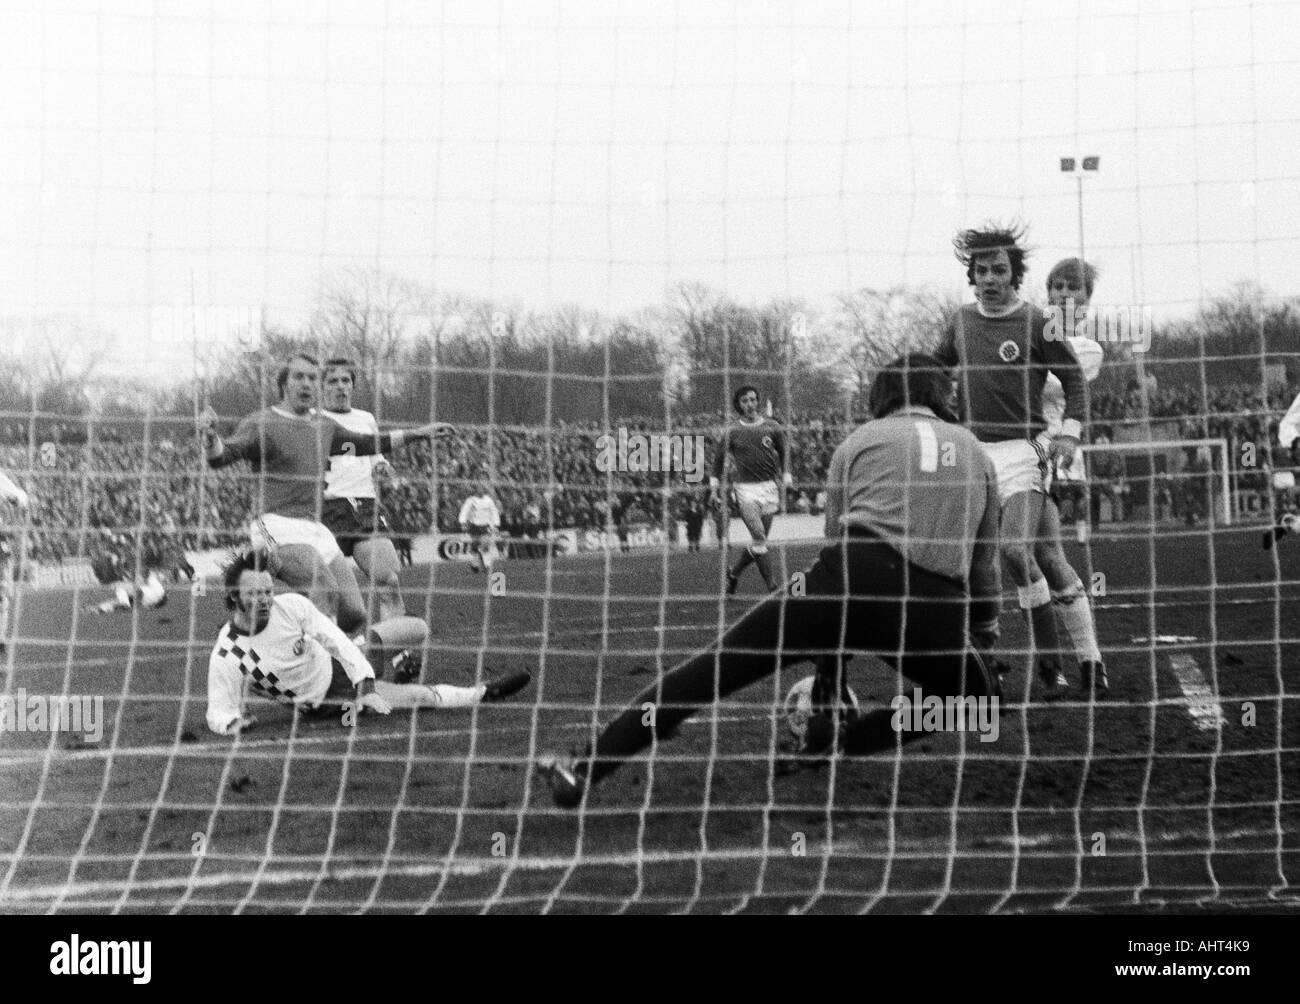 football, Bundesliga, 1970/1971, Niederrhein Stadium, Rot-Weiss Oberhausen versus Rot-Weiss Essen 0:0, scene of the match, f.l.t.r. Wolfgang Rausch (RWE), Lothar Kobluhn (RWO), Roland Peitsch (RWE), Wolfgang Suehnholz (RWO), keeper Fred Werner Bockholt (R - Stock Image